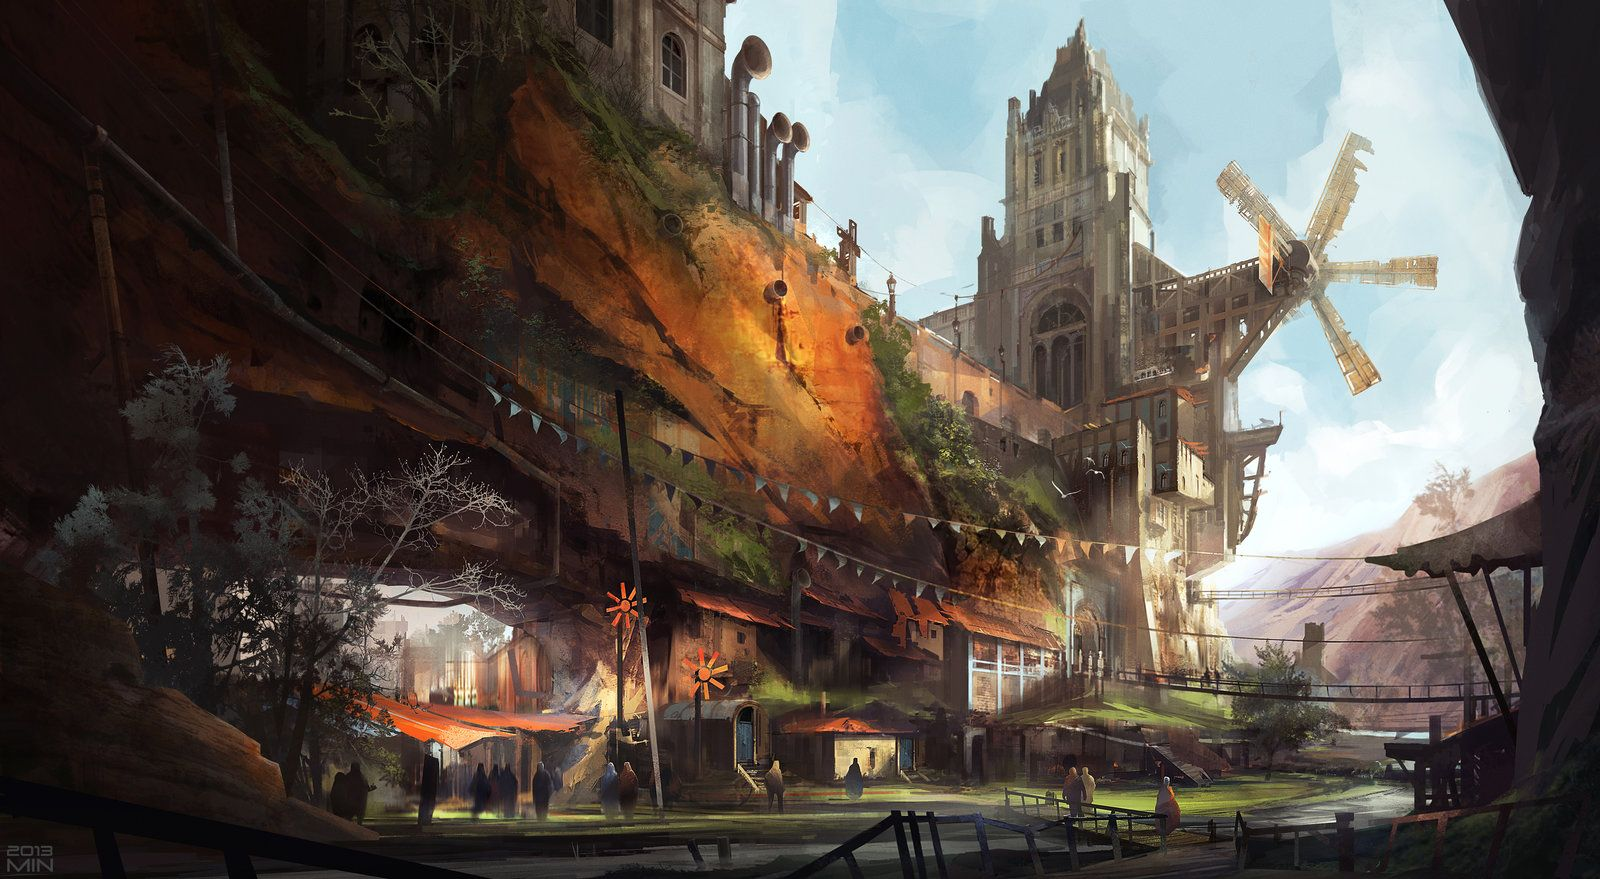 Wind city, Min Nguen on ArtStation at https://www.artstation.com/artwork/airship-74c55234-ed29-442d-a46e-29ee93e2eddd